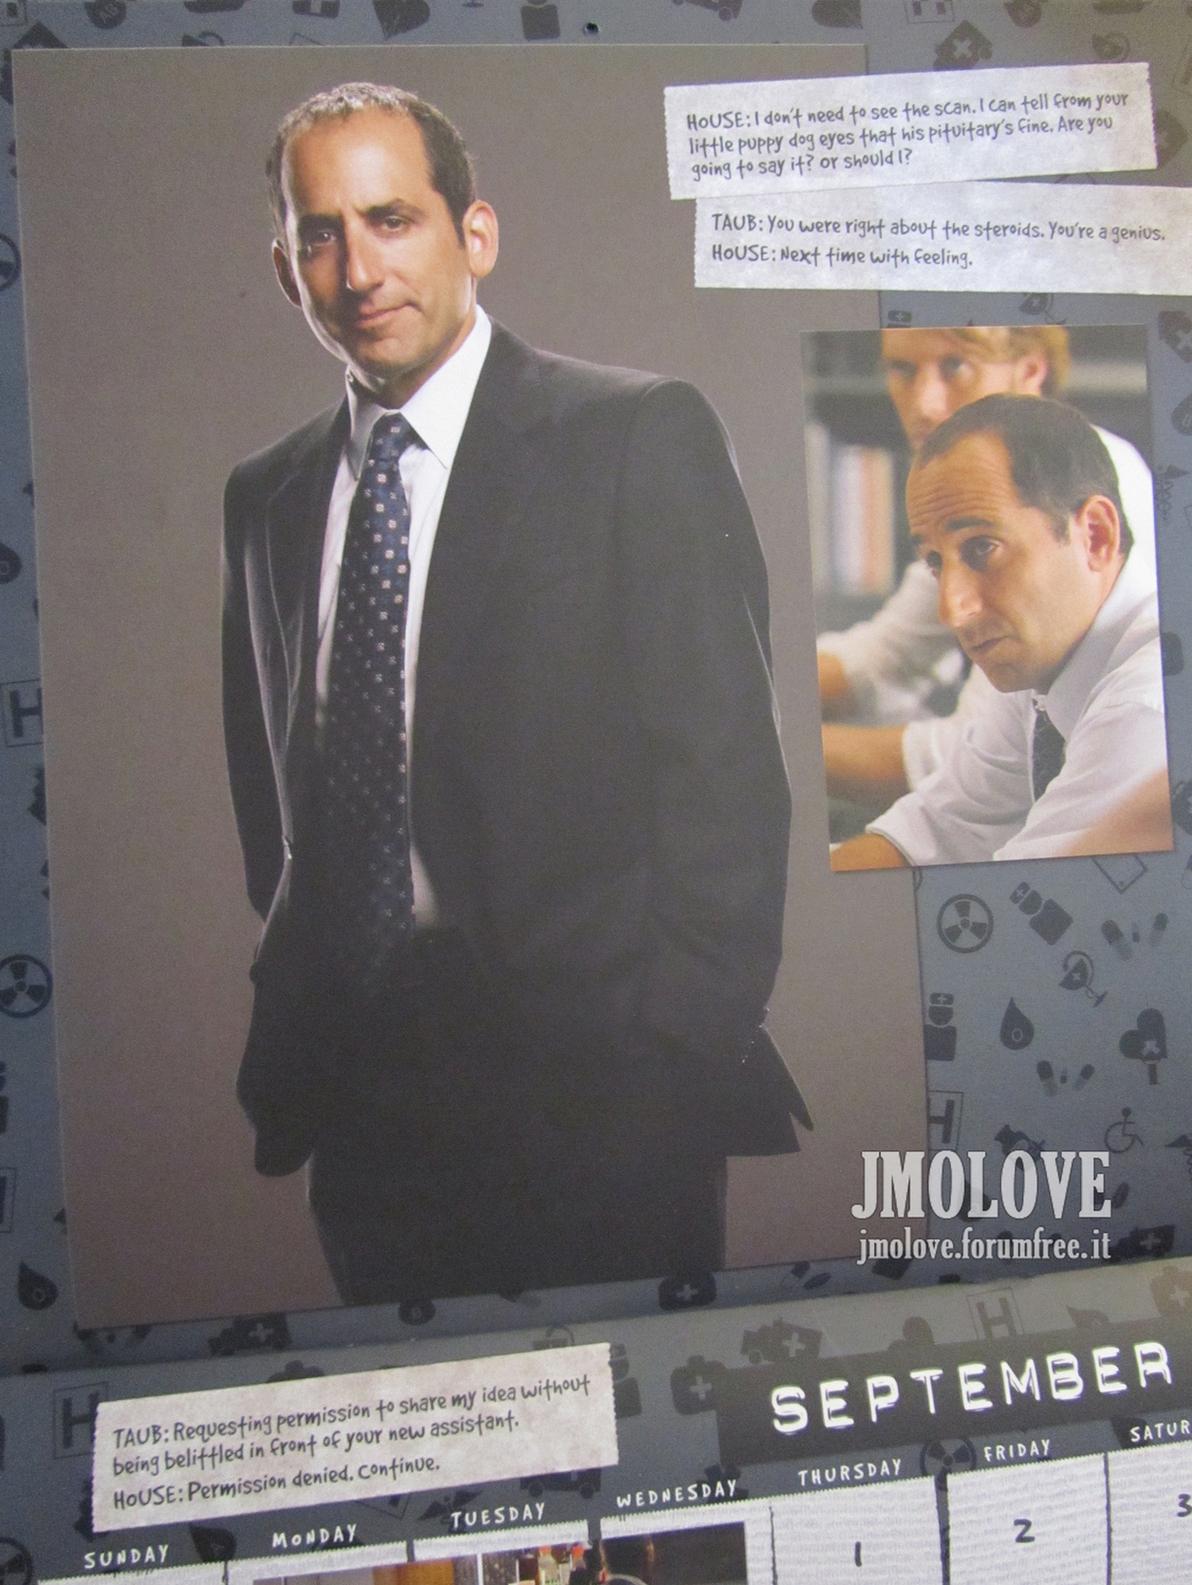 House: 2011 Calendar Scan